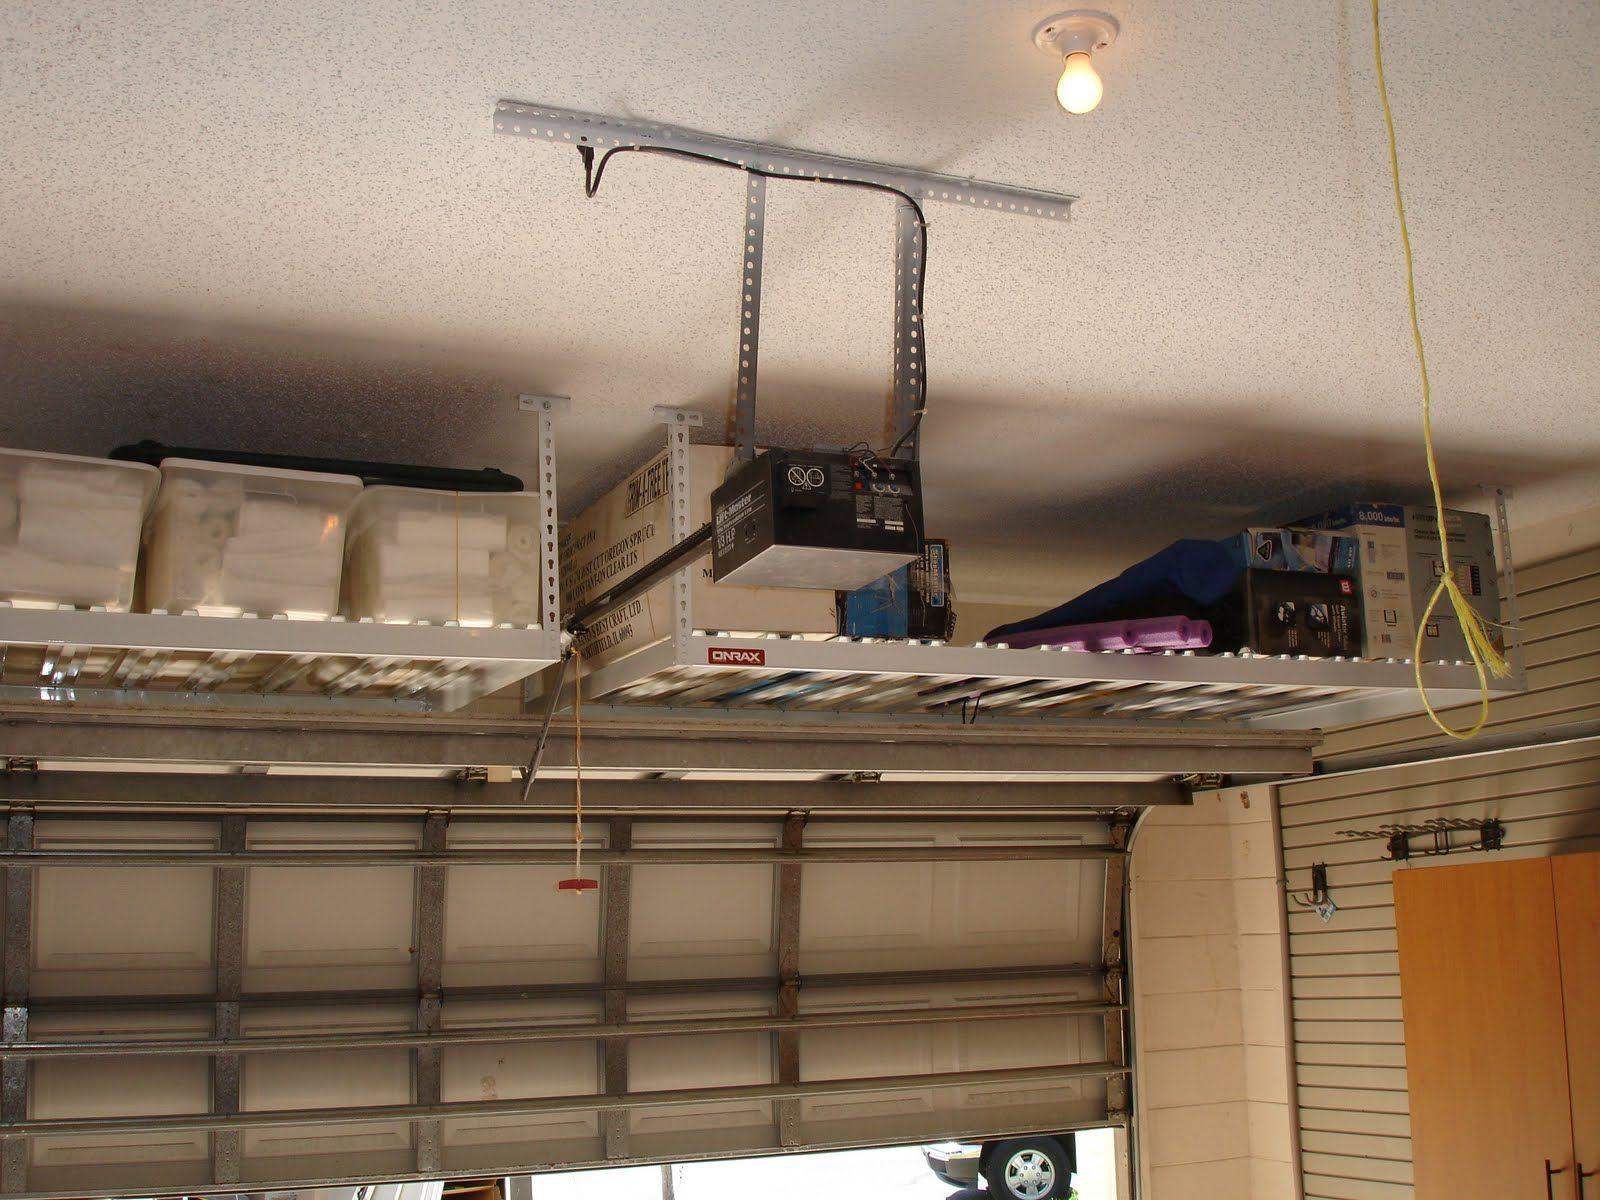 Garage Overhead Storage Google Search Diy Overhead Garage Storage Garage Storage Bins Ceiling Storage Rack